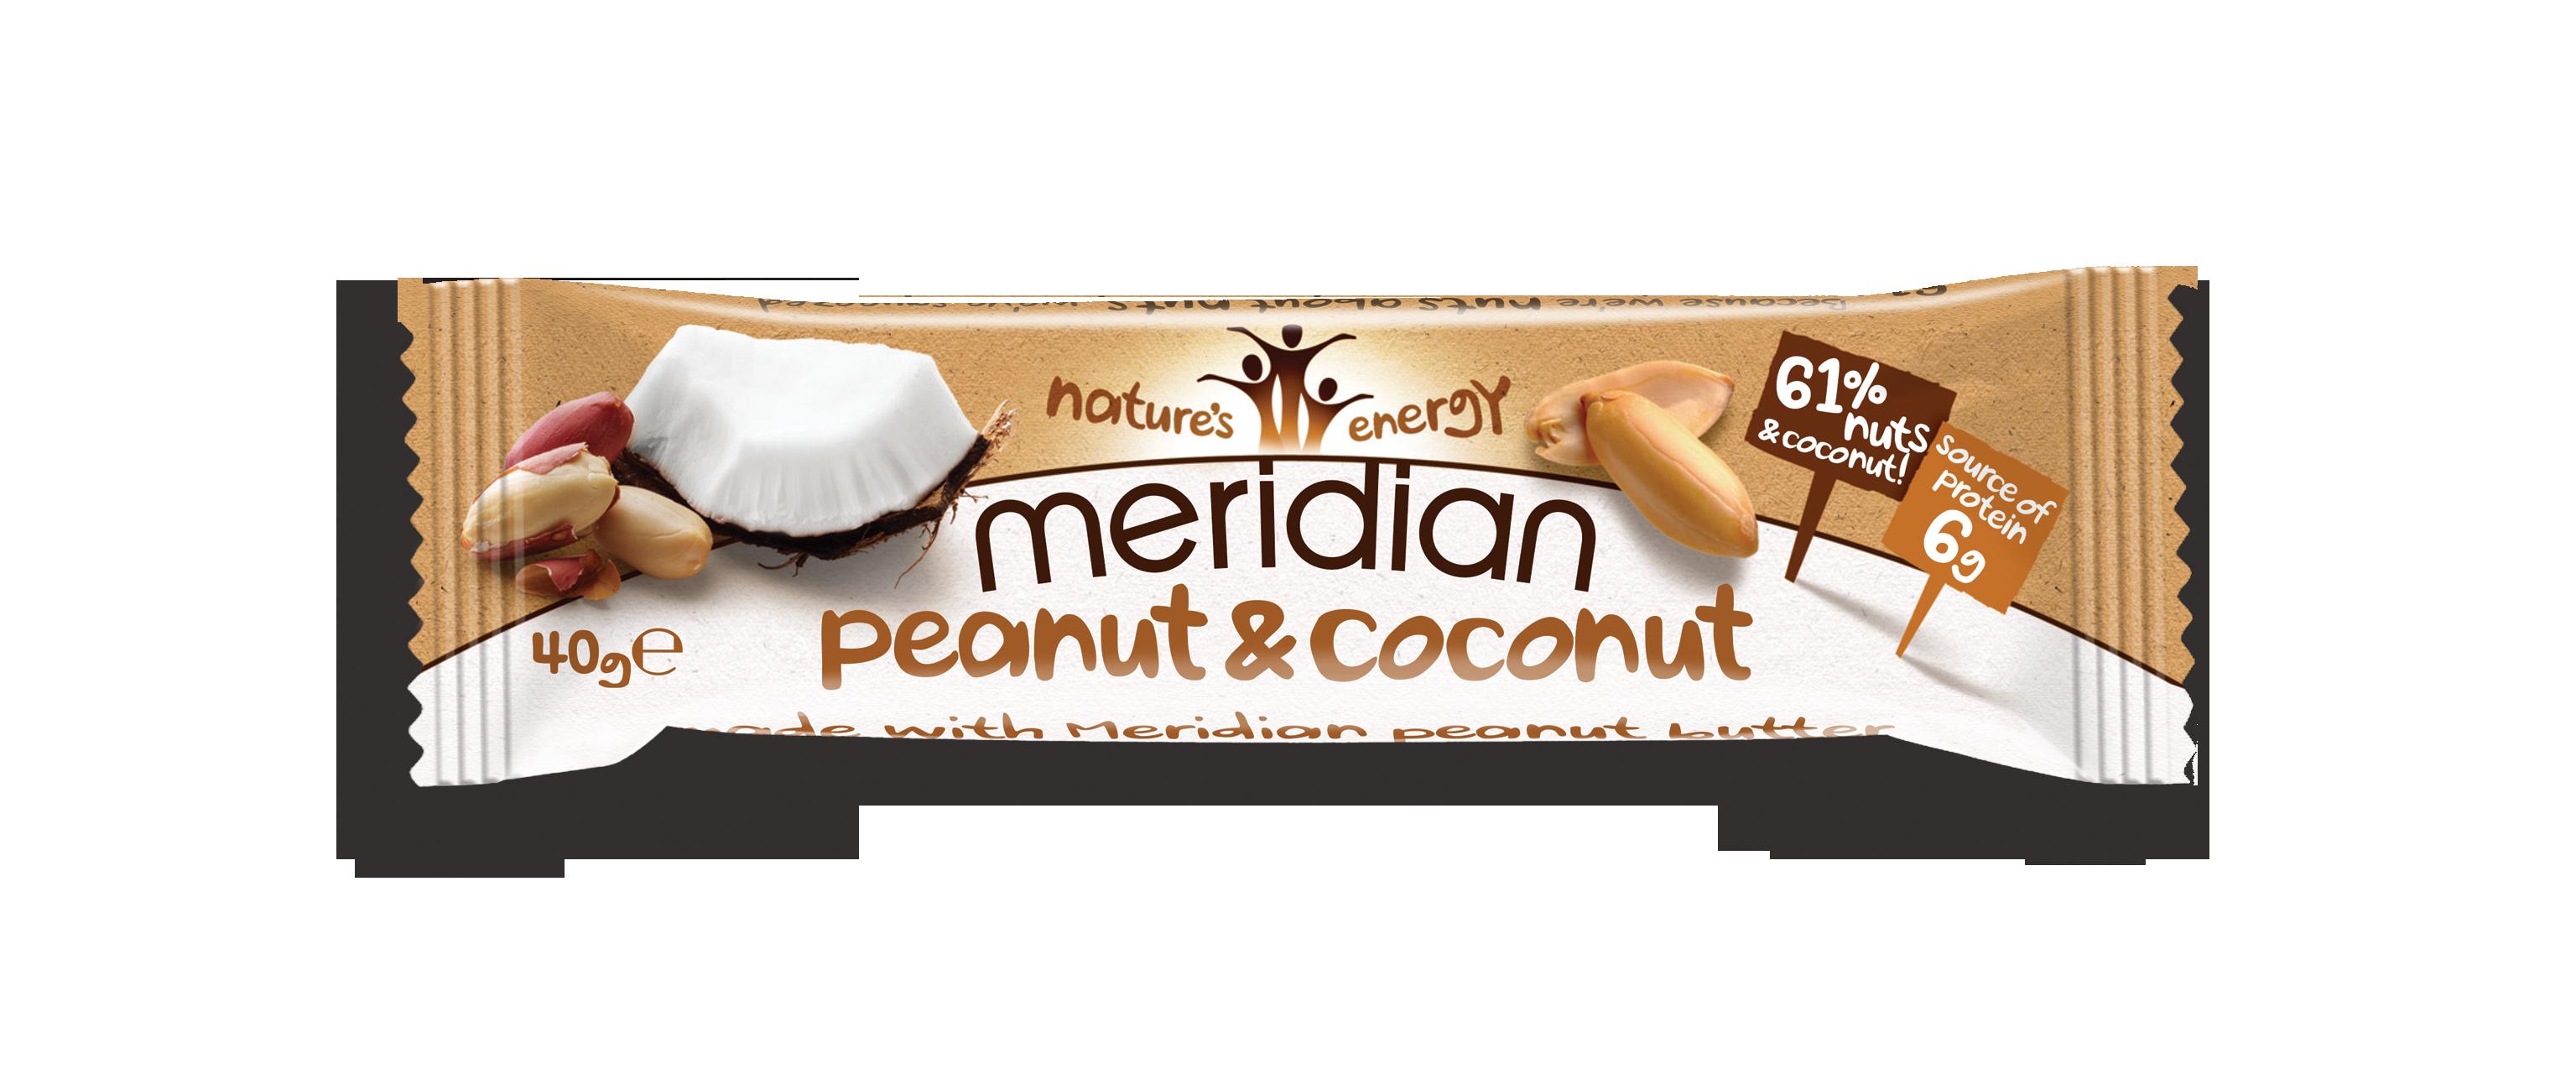 Peanut and Coconut